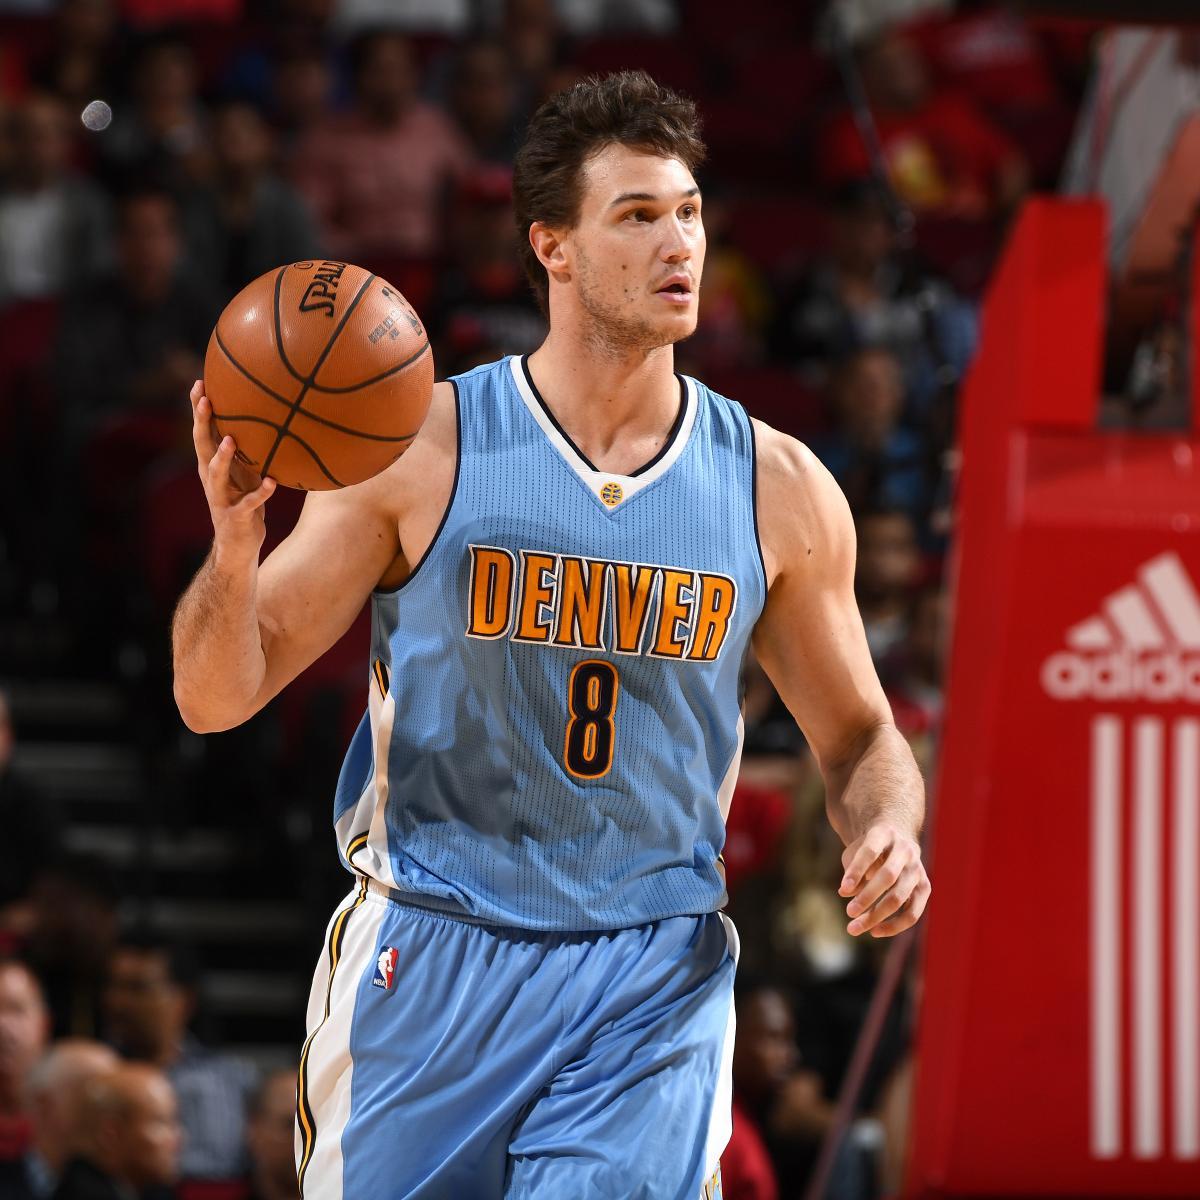 Denver Nuggets Espn: Danilo Gallinari Rumors: Clippers Seeking 3rd Team For